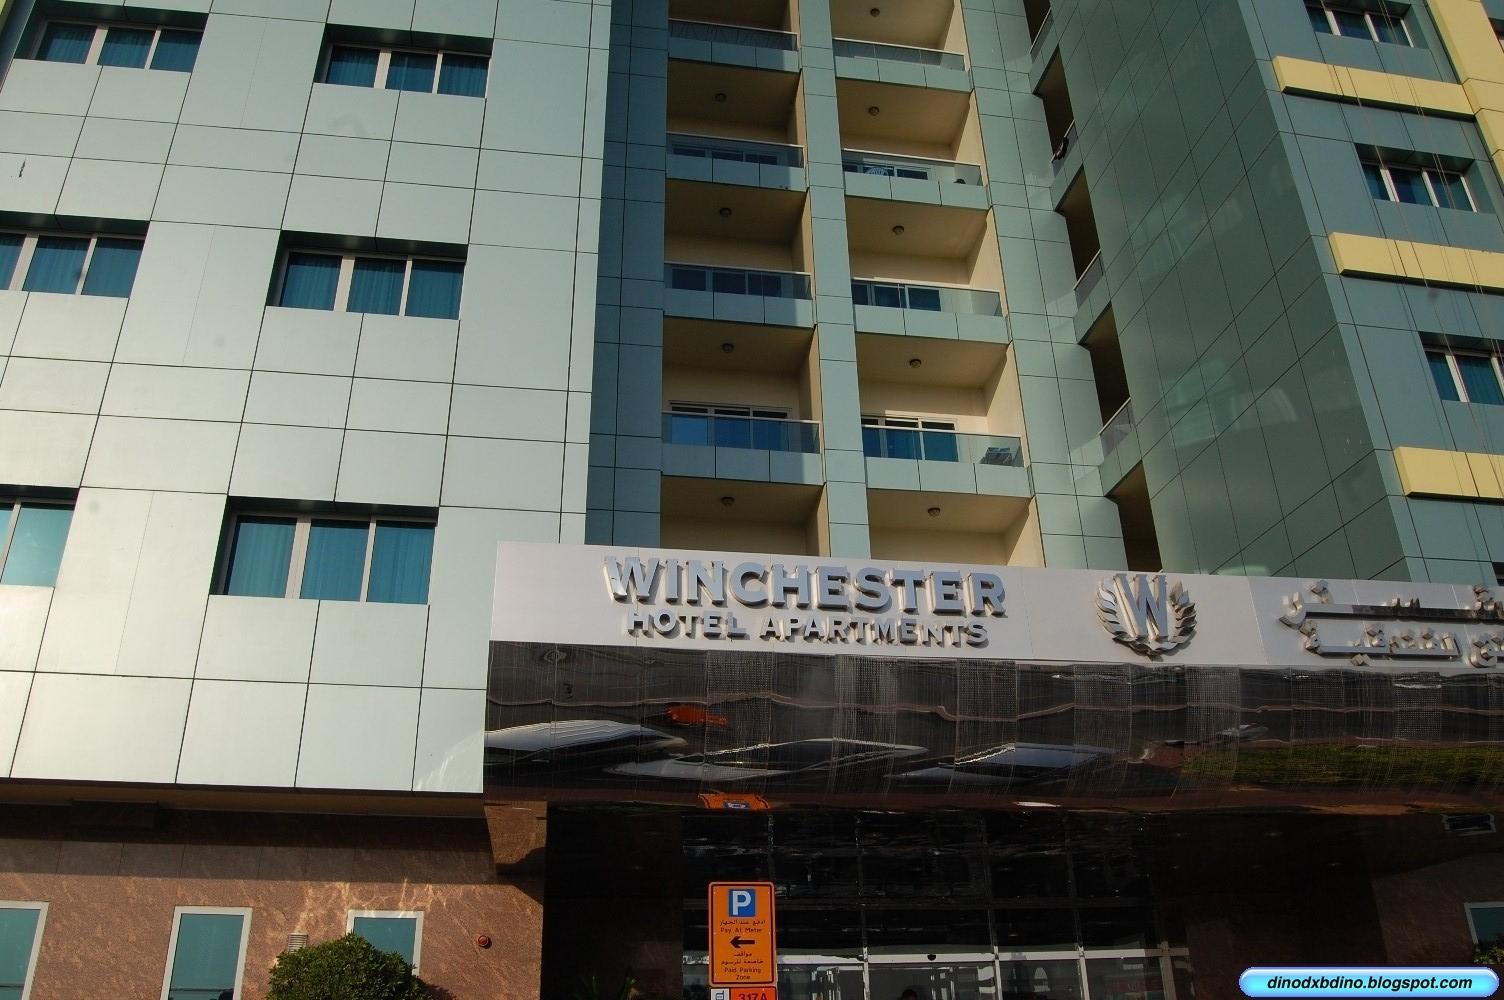 Winchester hotel apartments al kuwait street dubai for K porte inn hotel dubai